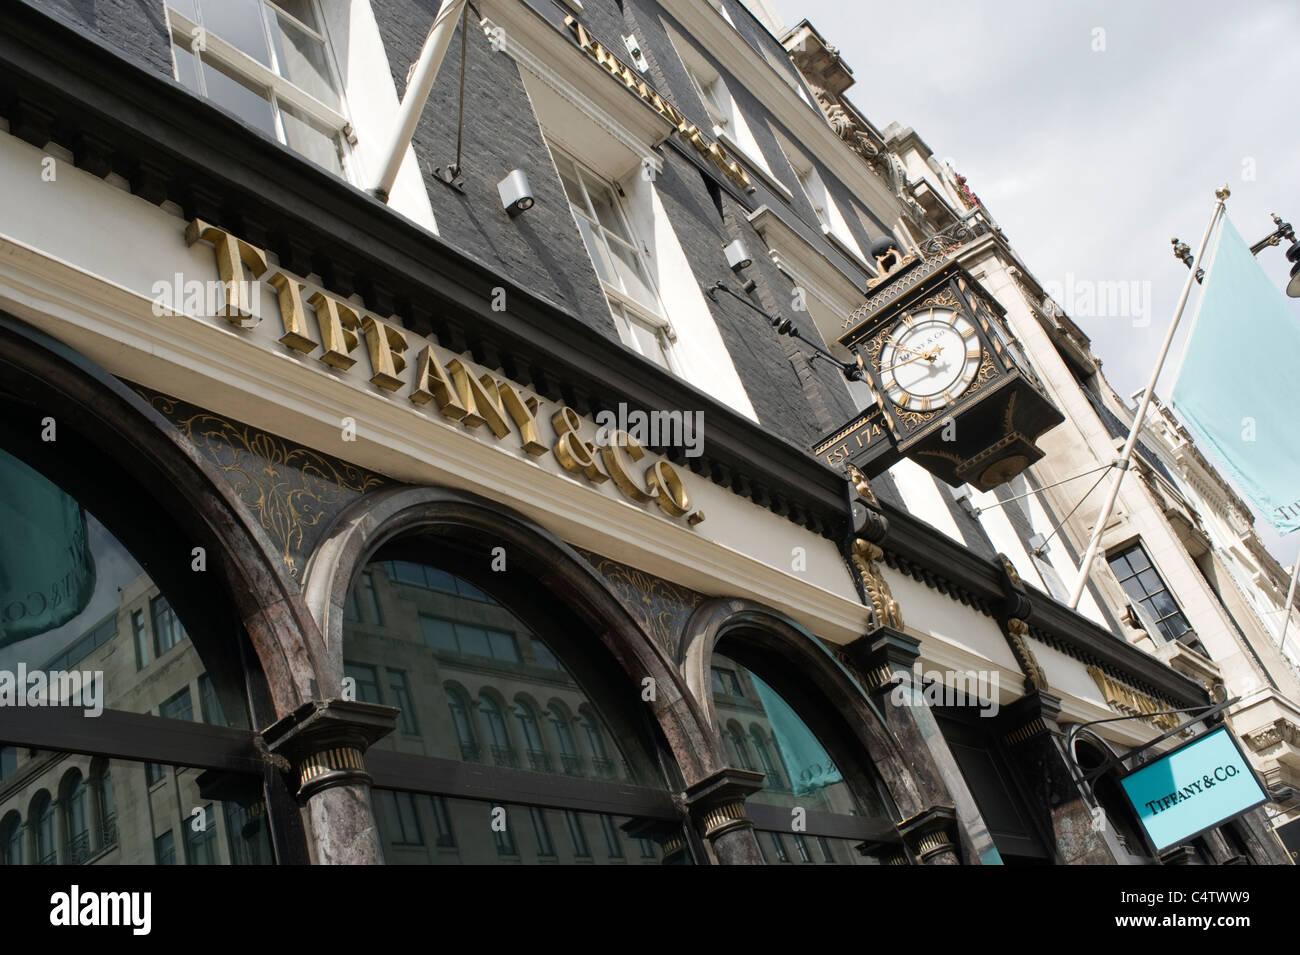 aa91ff226b6 London Mayfair Bond Street Tiffany   Co jewelers jewelry shop store  flagpoles flagpole established 1749 -